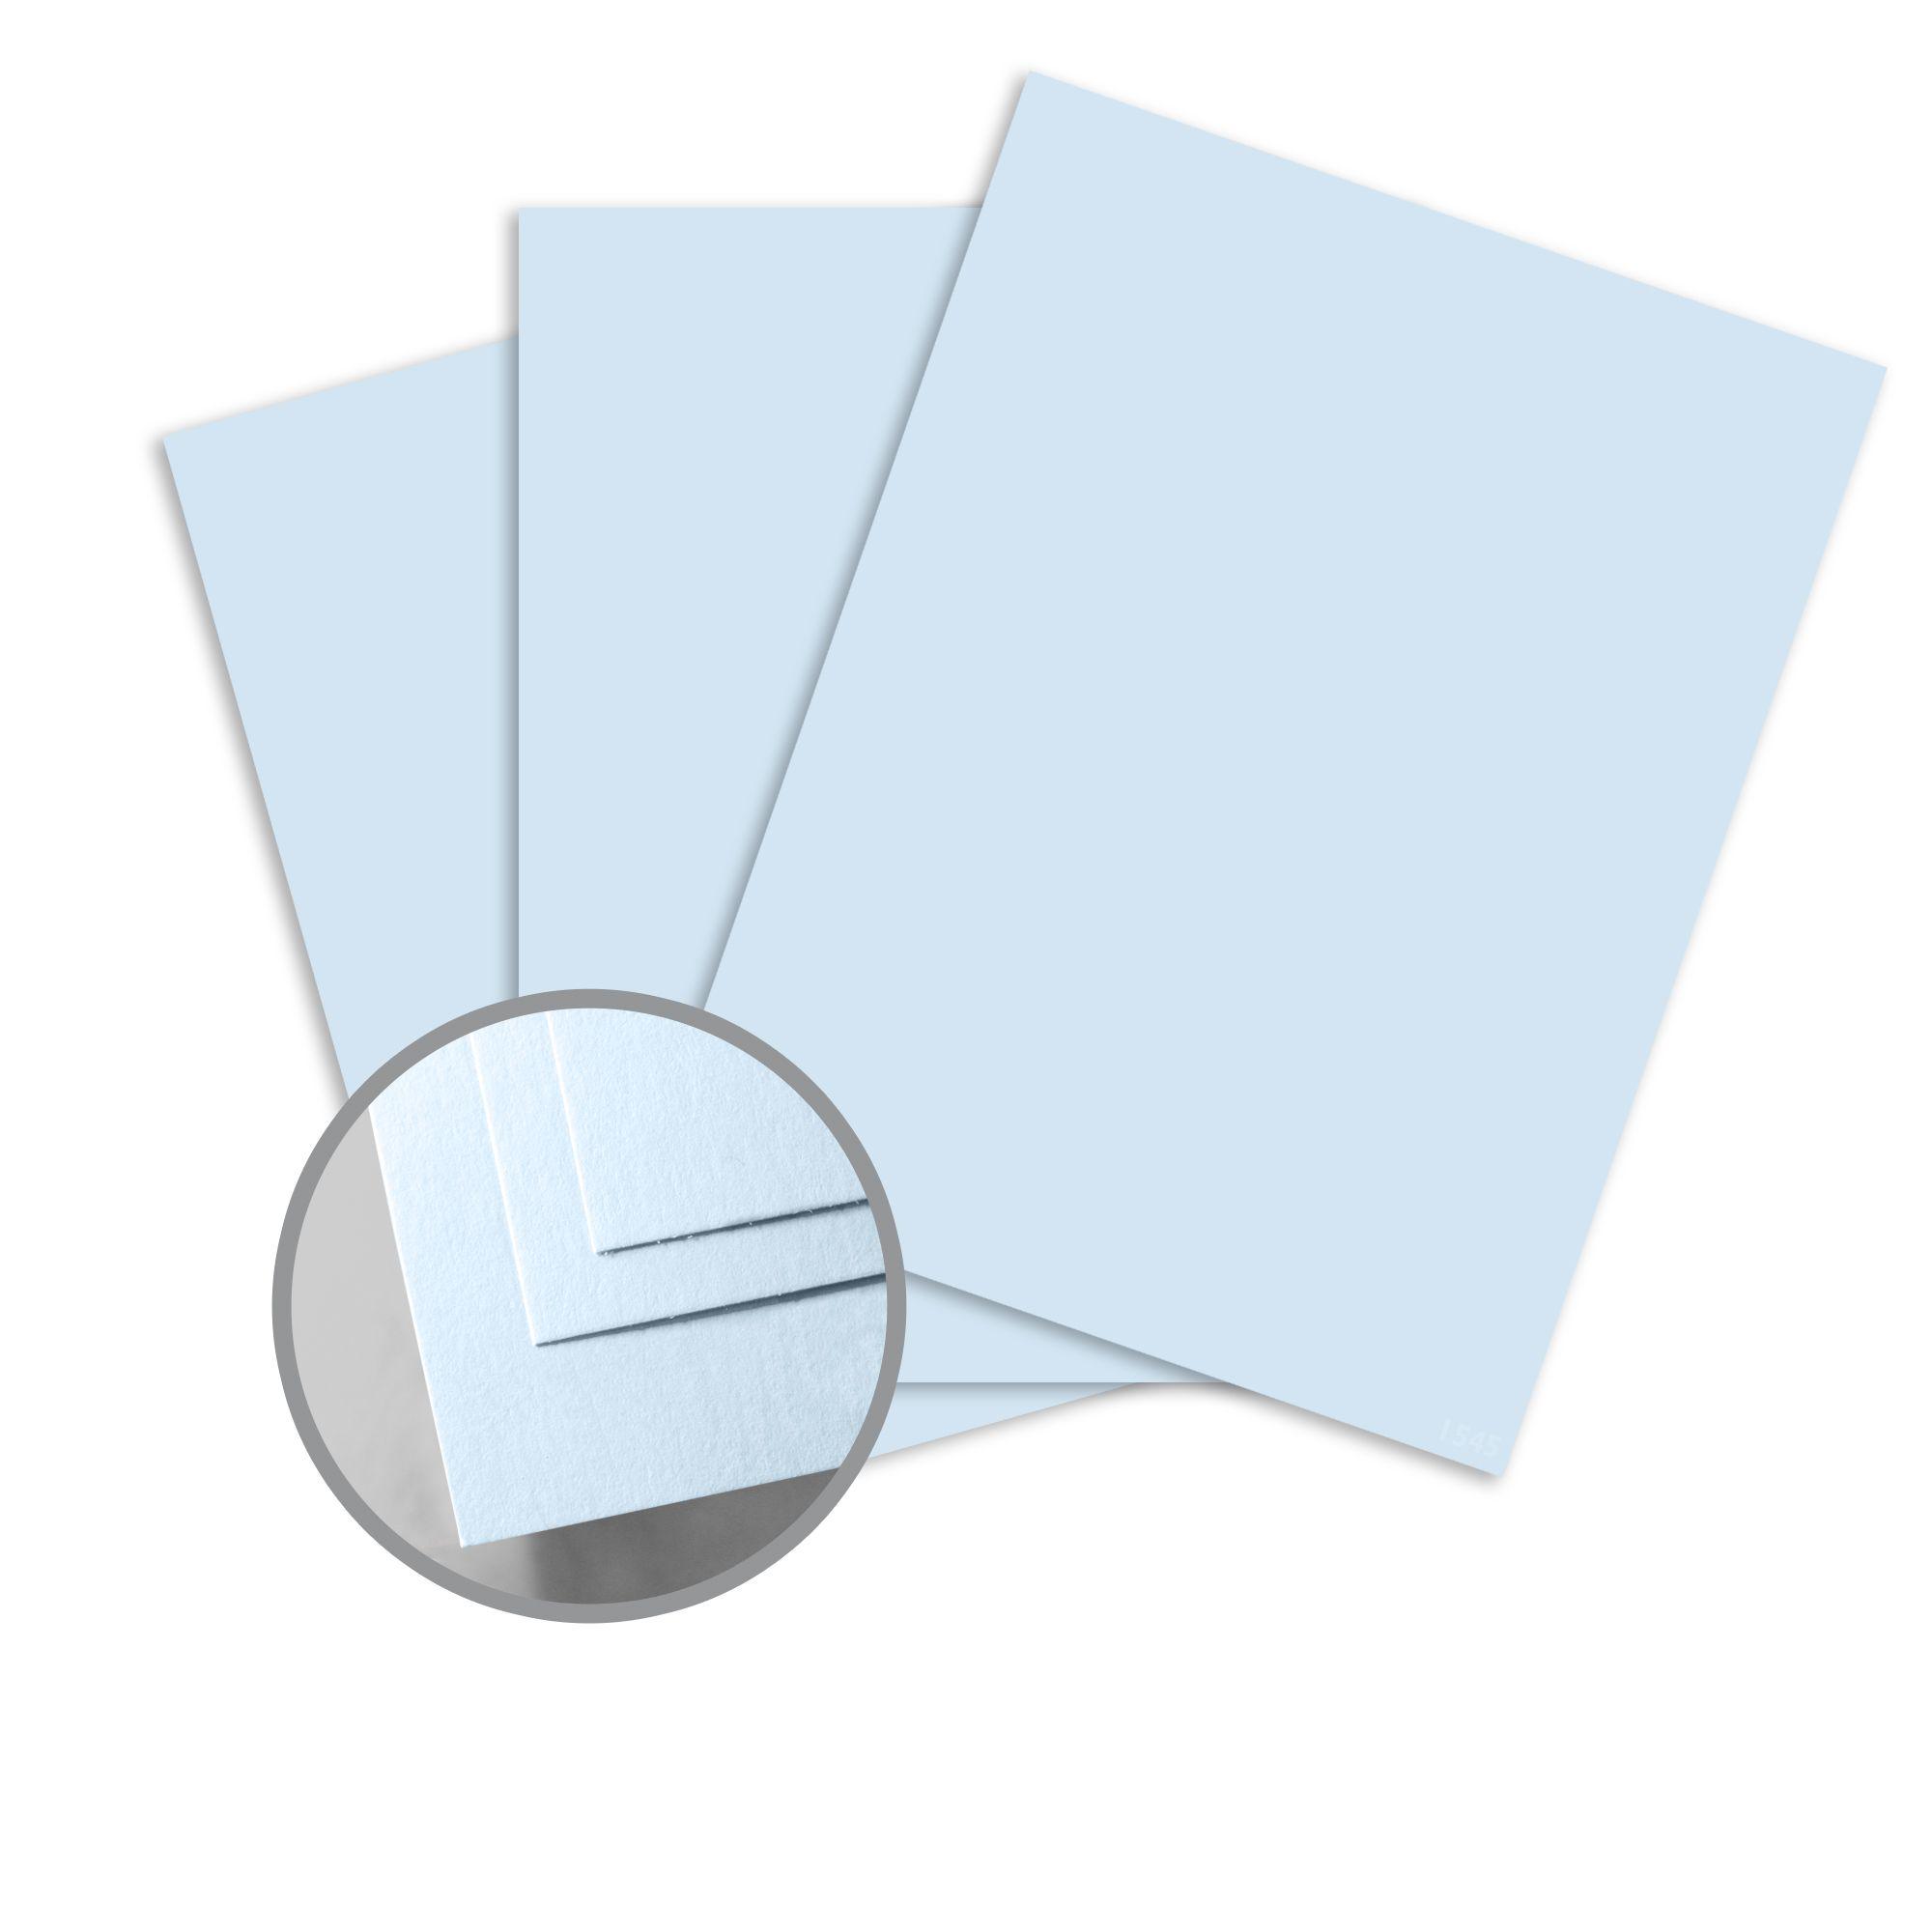 Vellum White Colorplan